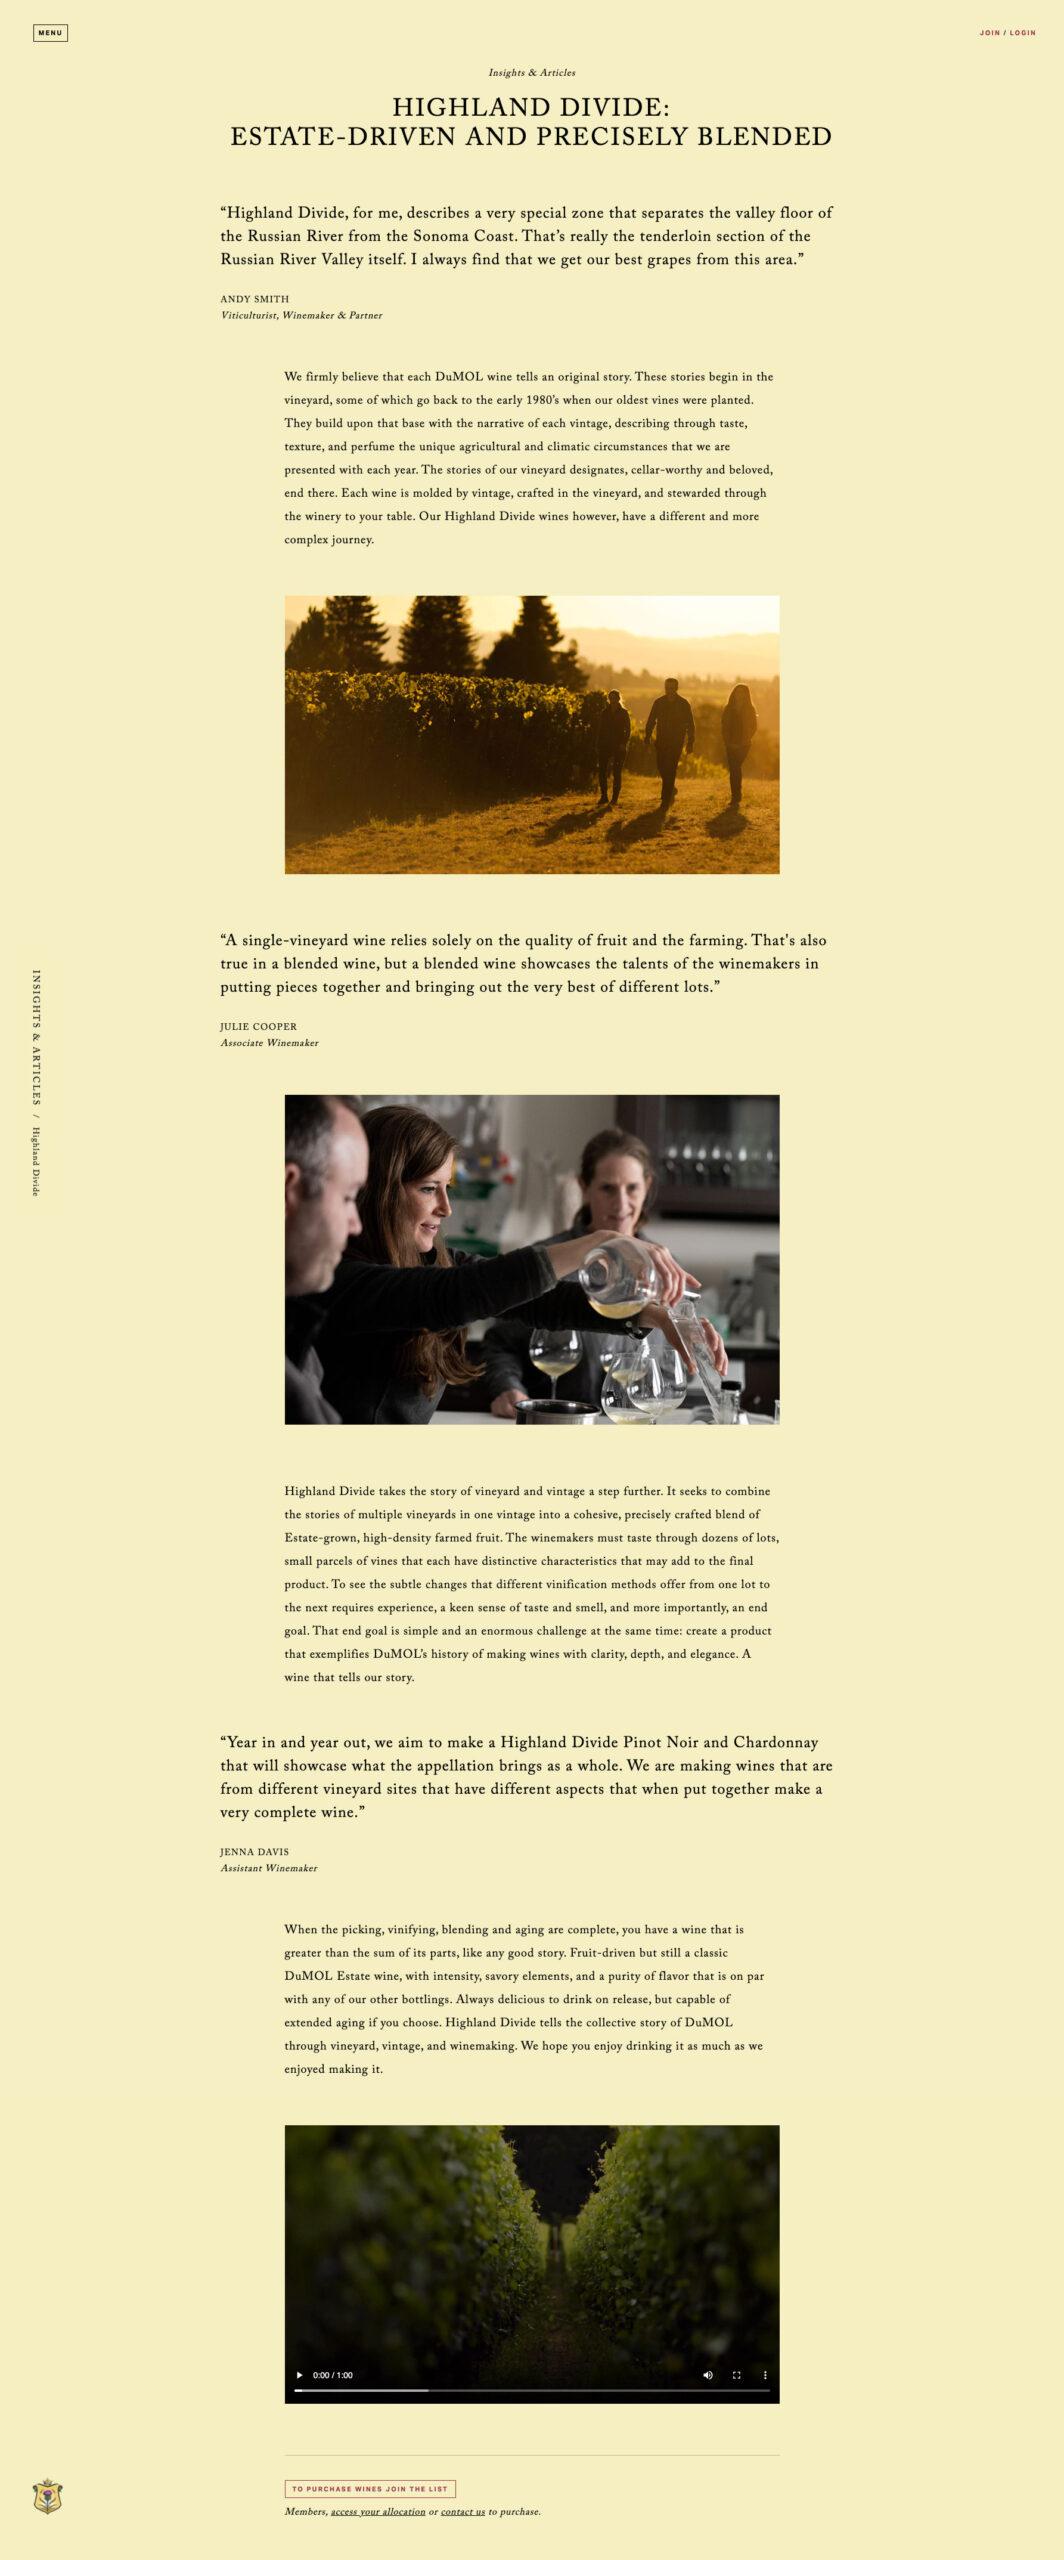 DuMol website story example